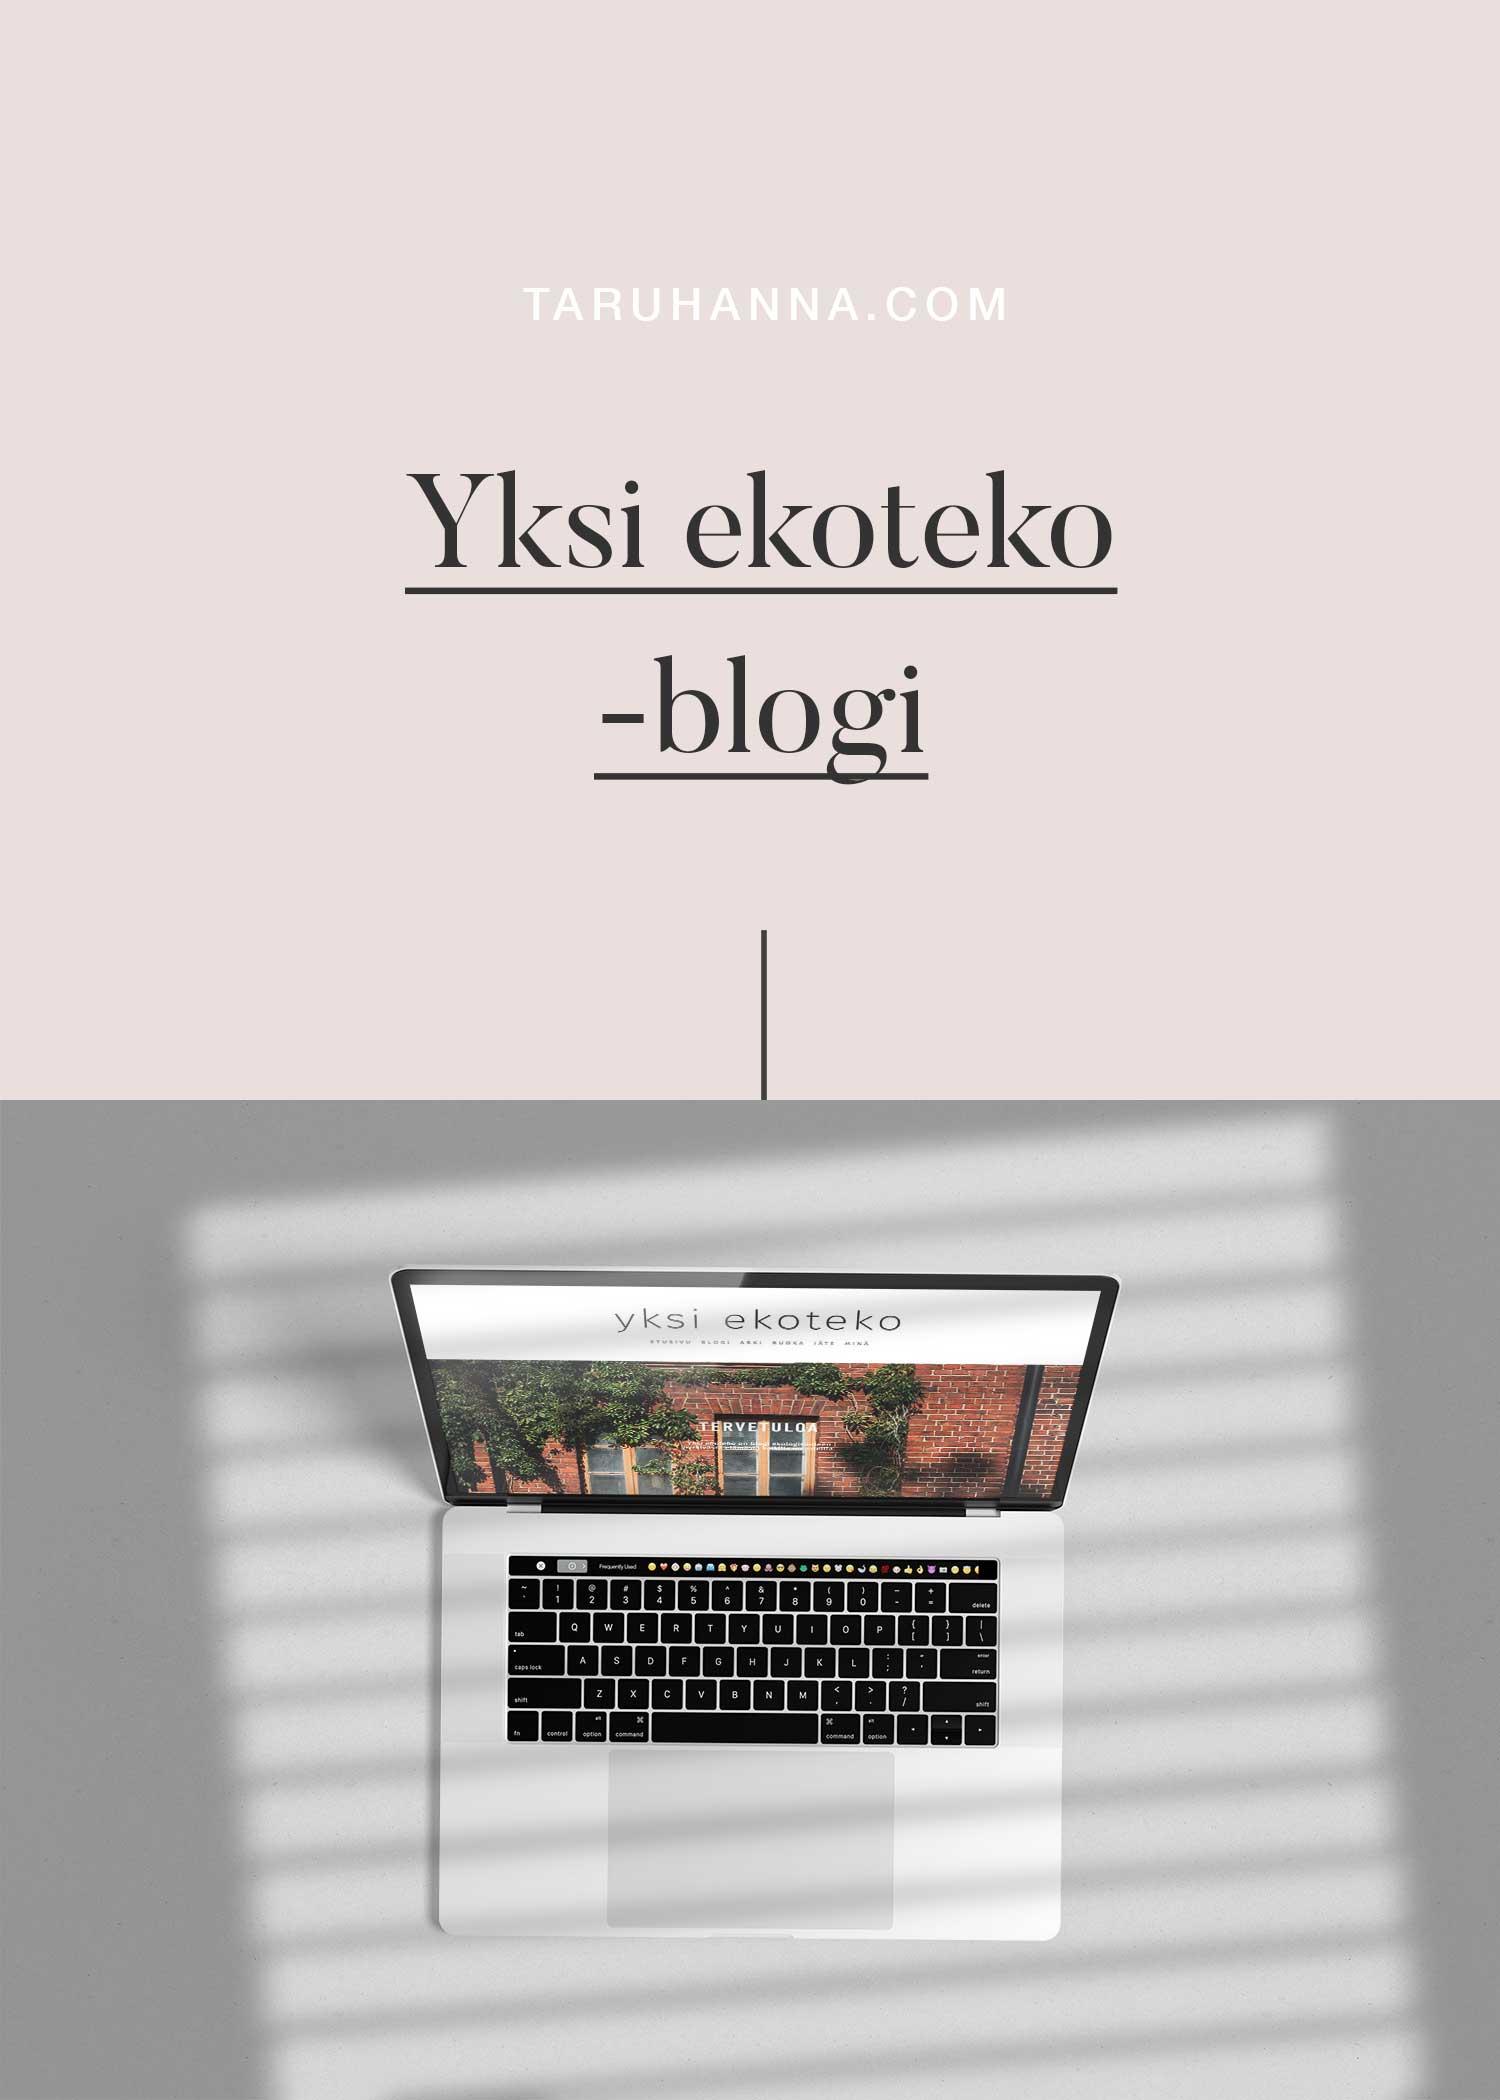 Yksi ekoteko blogi